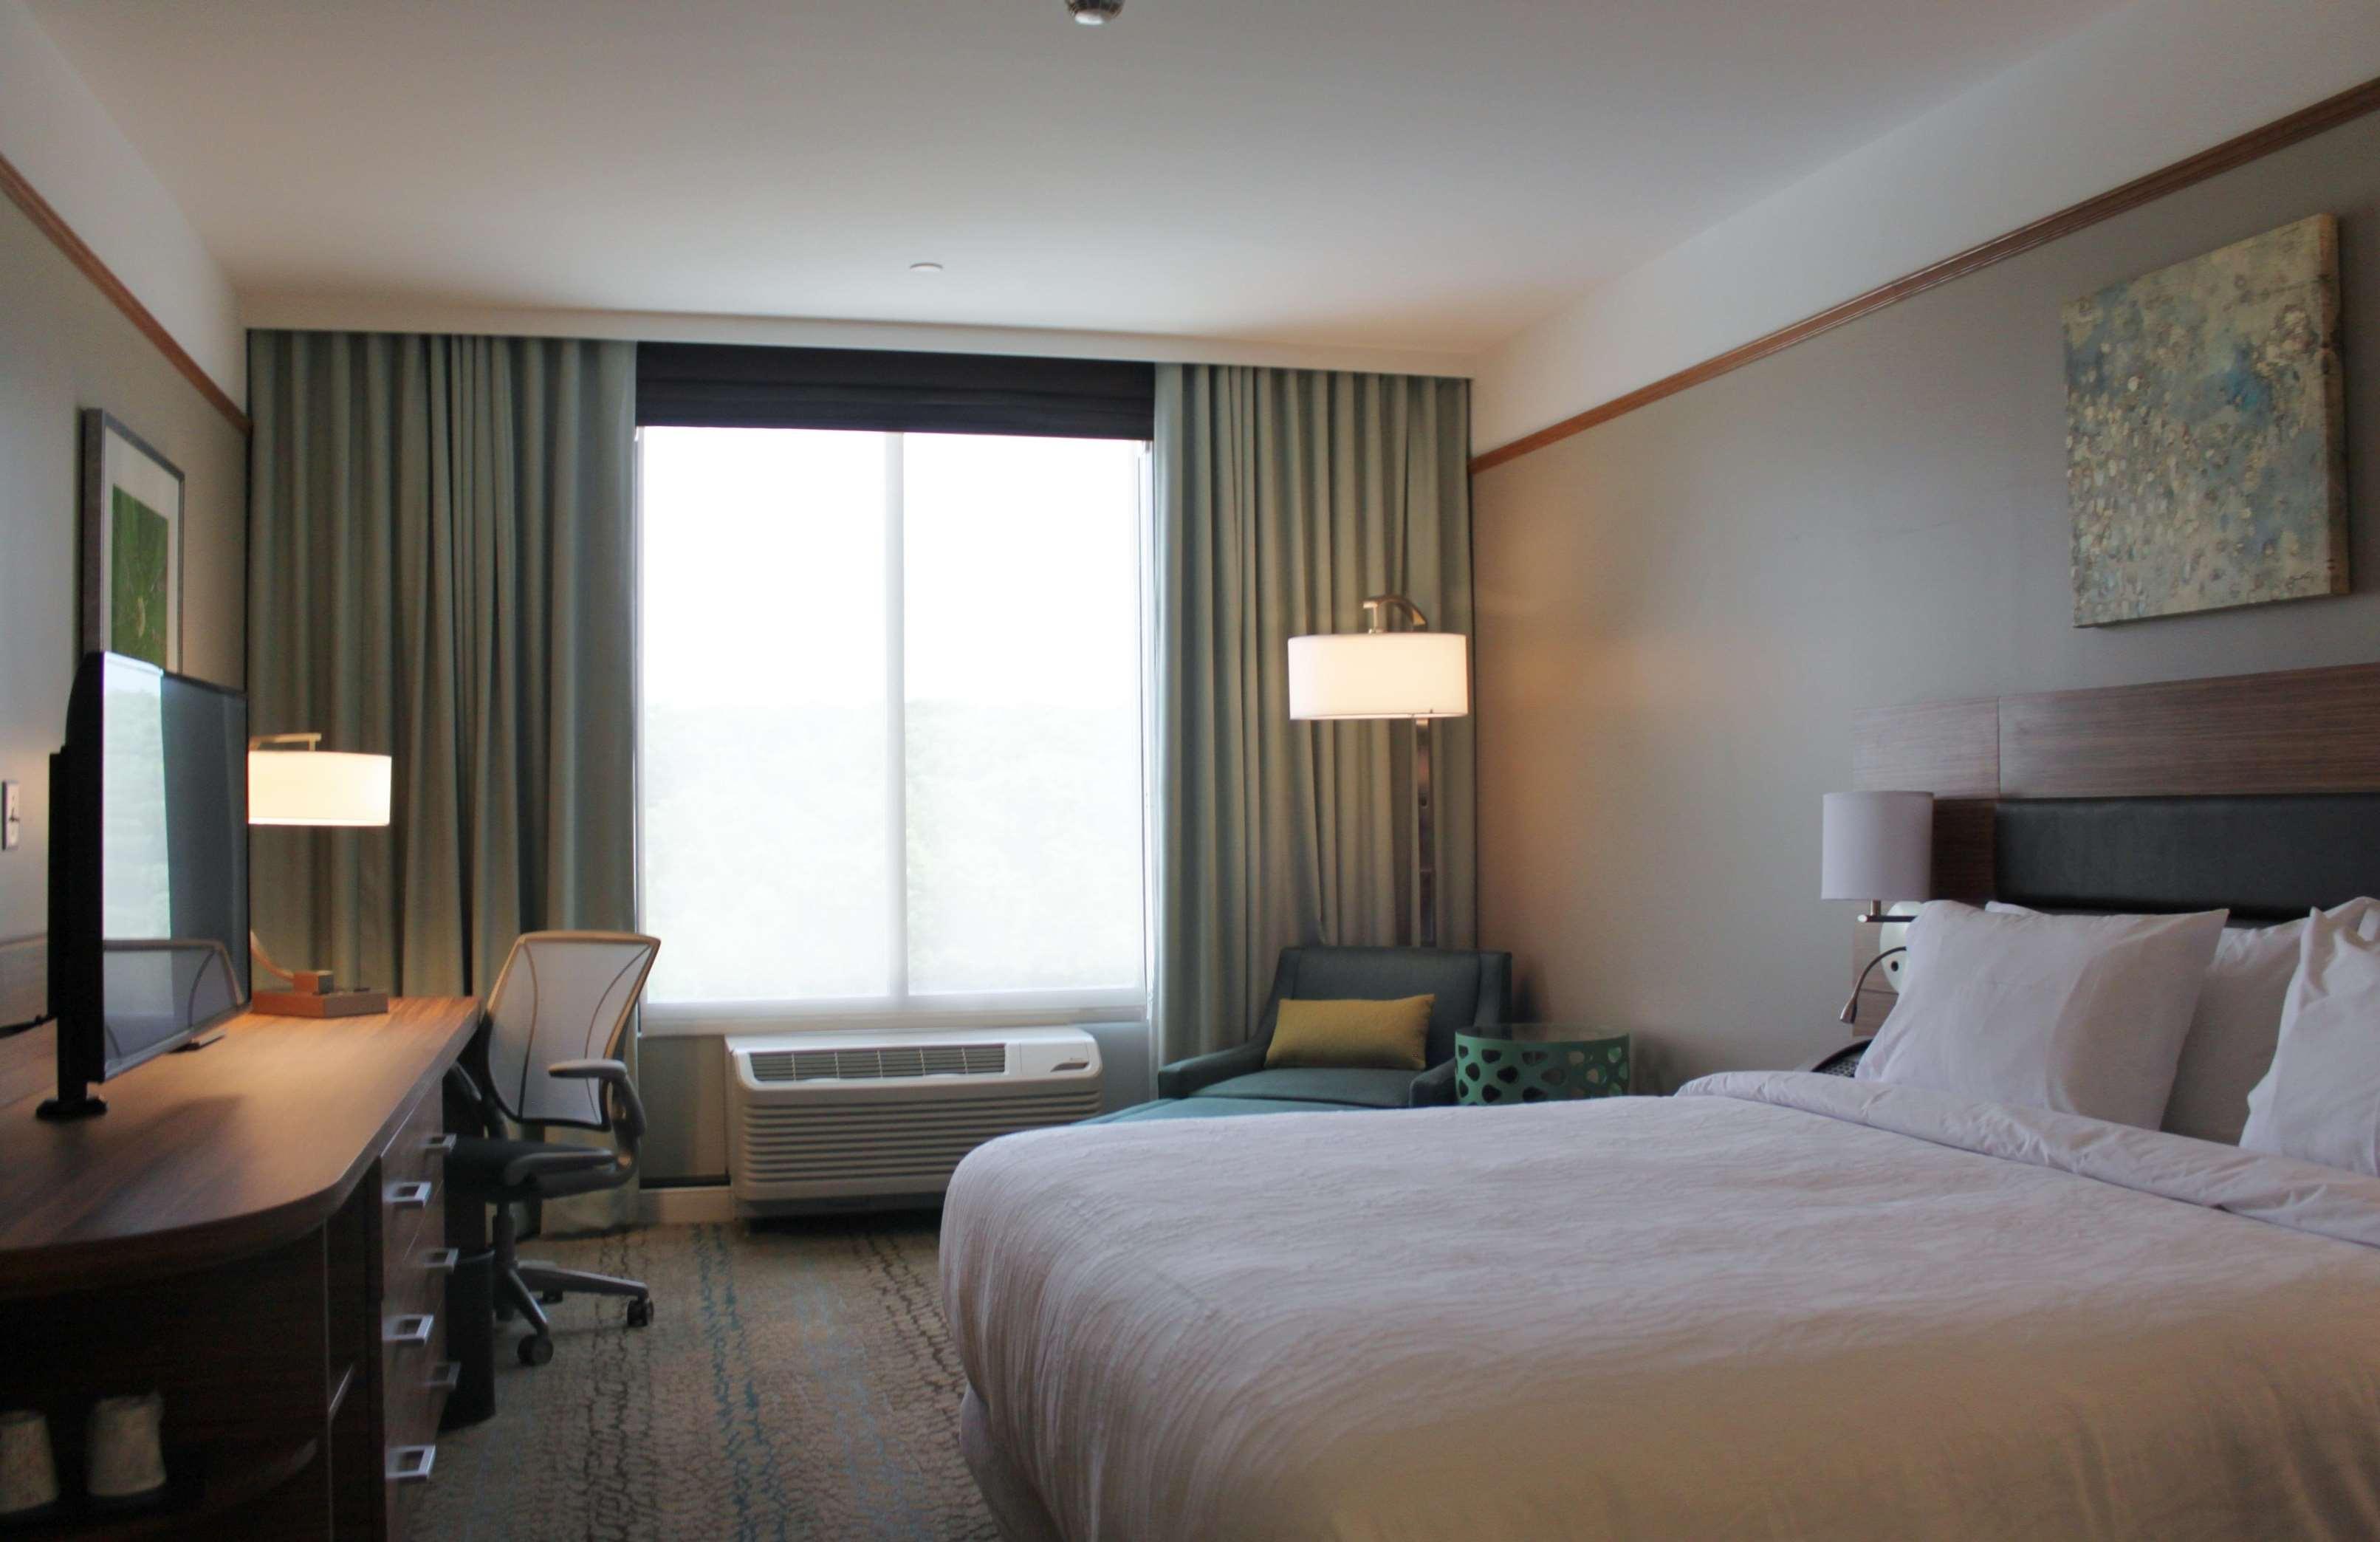 Hilton Garden Inn Boston/Marlborough image 6